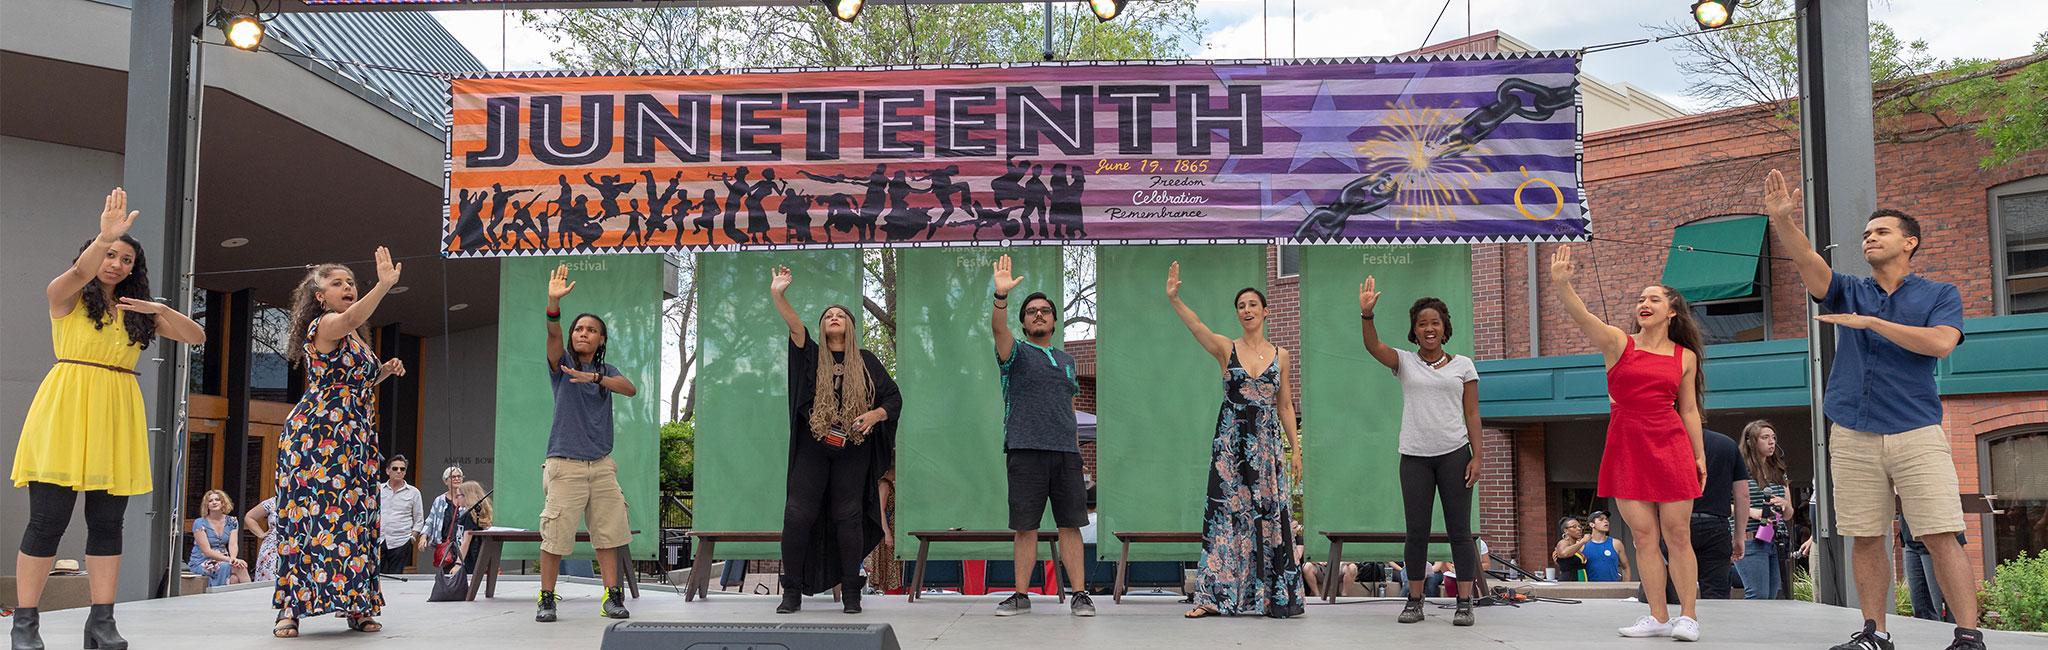 Oregon Shakespeare Festival - Juneteenth